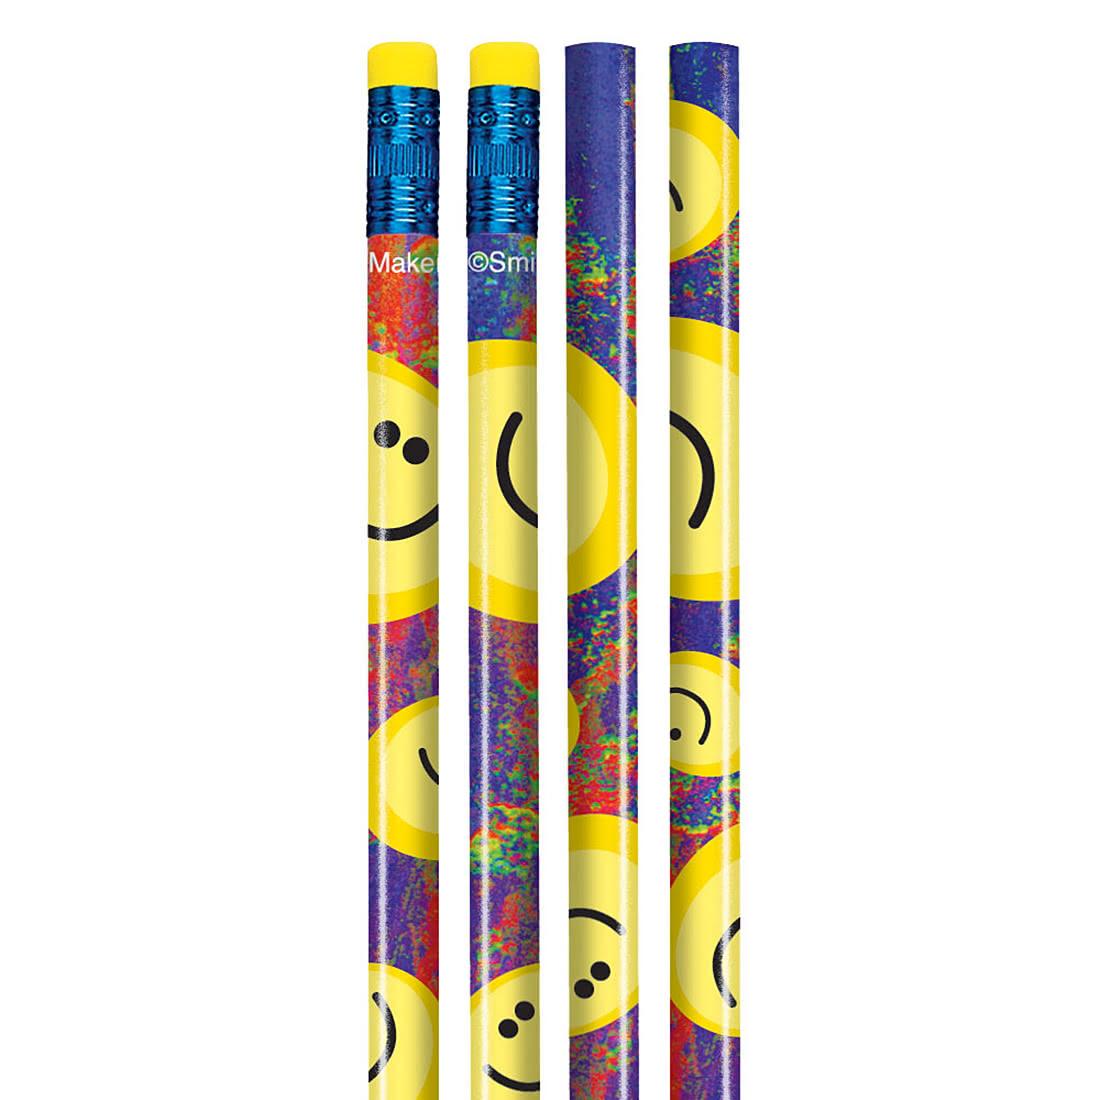 Pencils & Coloring